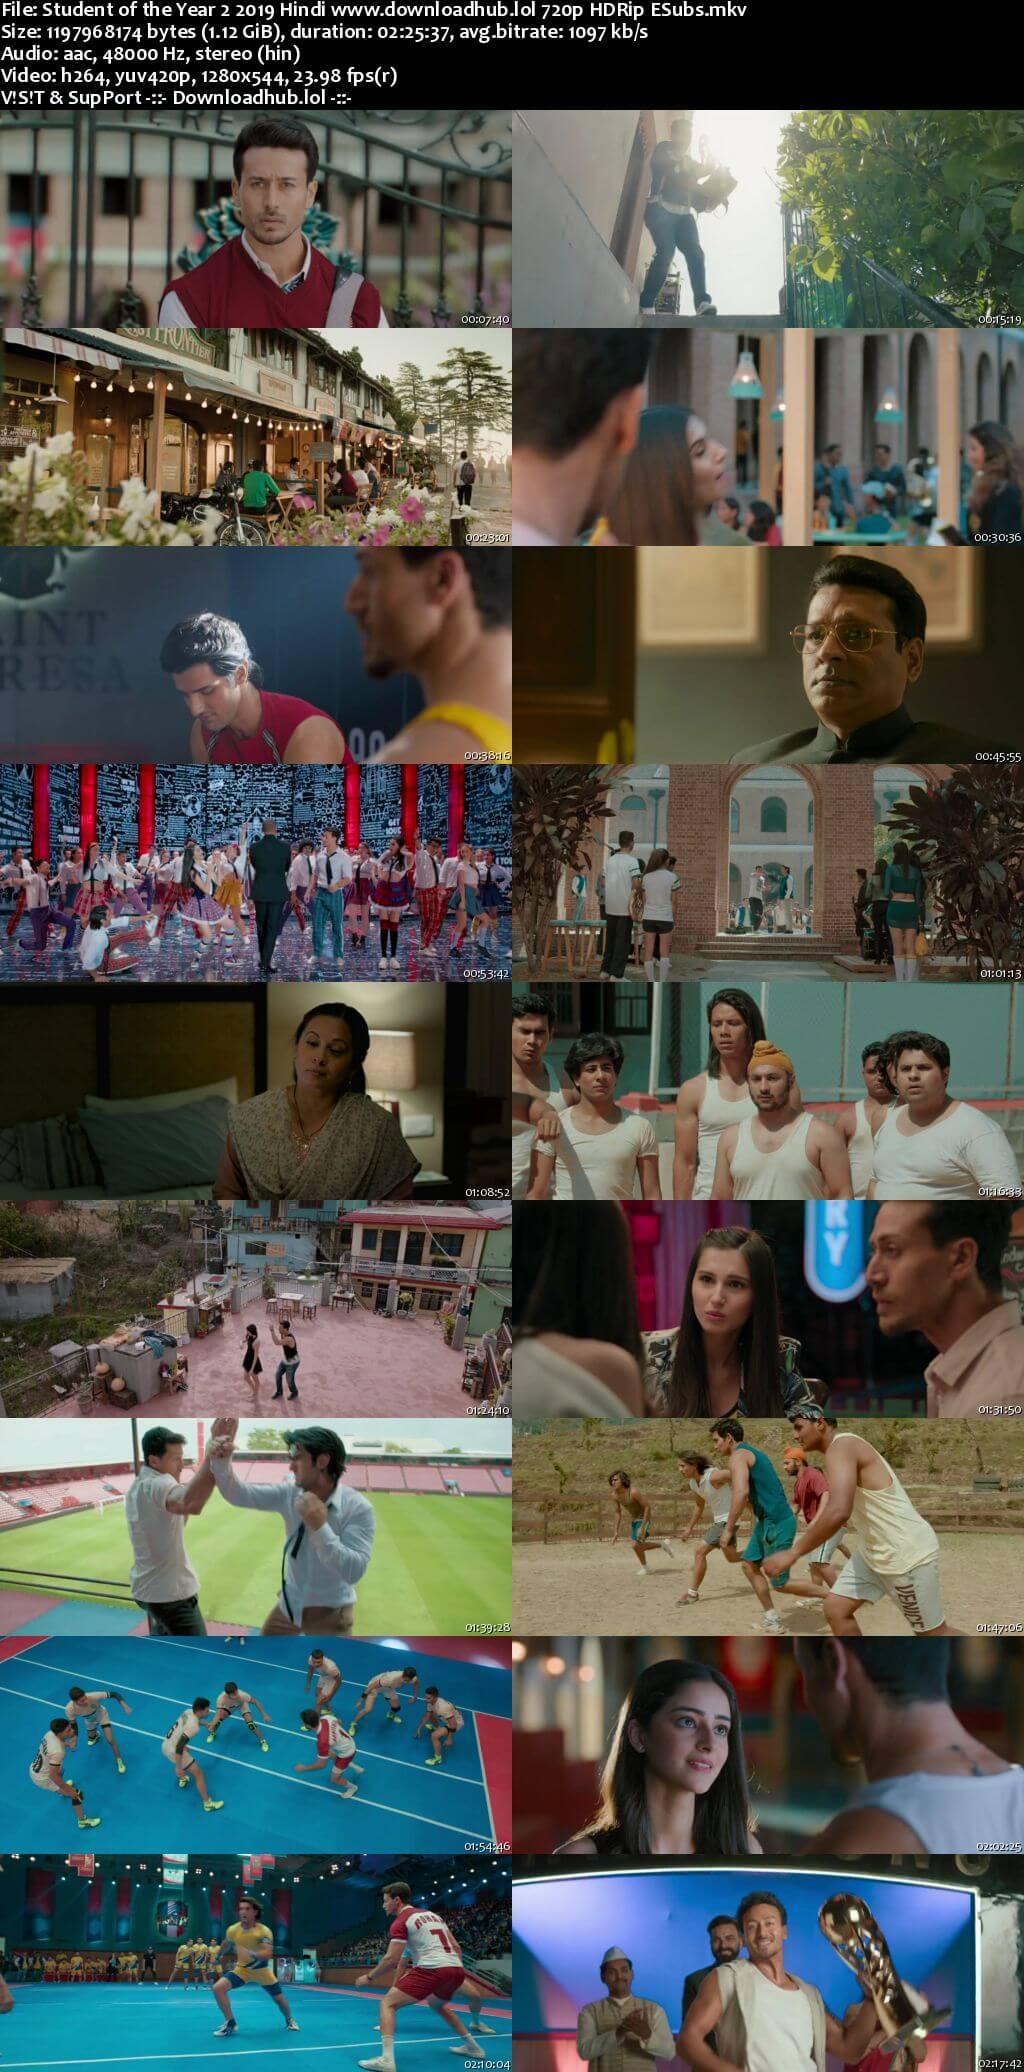 Student of the Year 2 2019 Hindi 720p HDRip ESubs